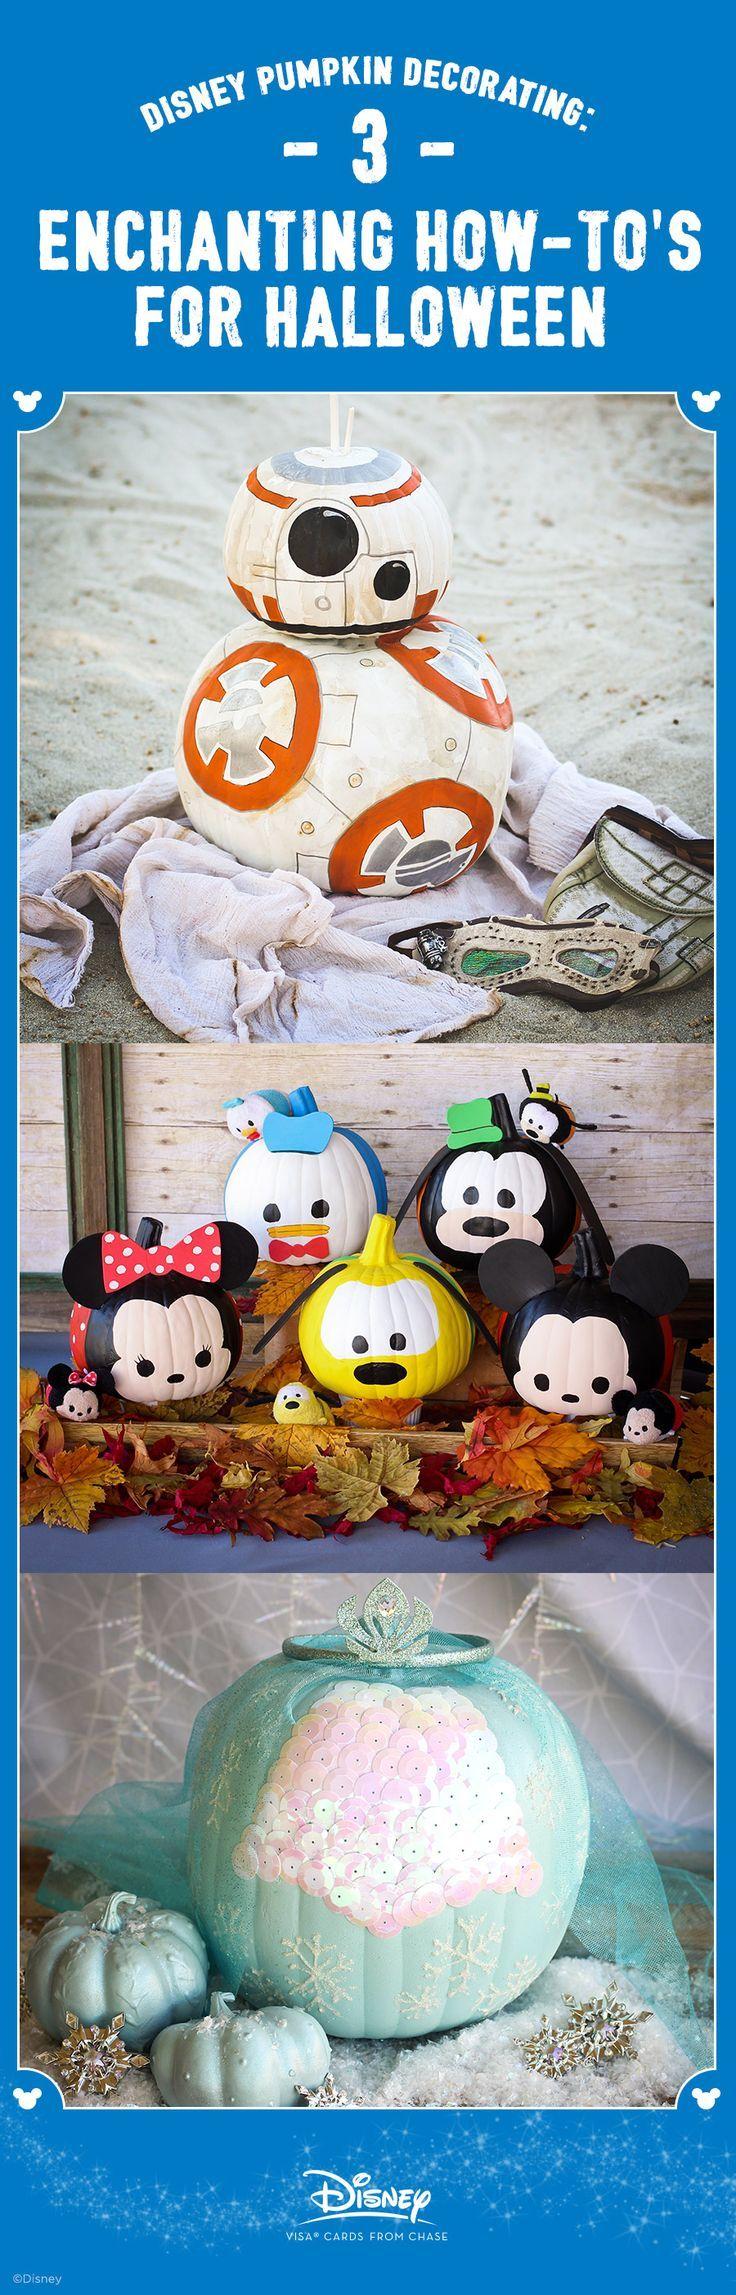 Disney pumpkin decorating enchanting how tos for halloween